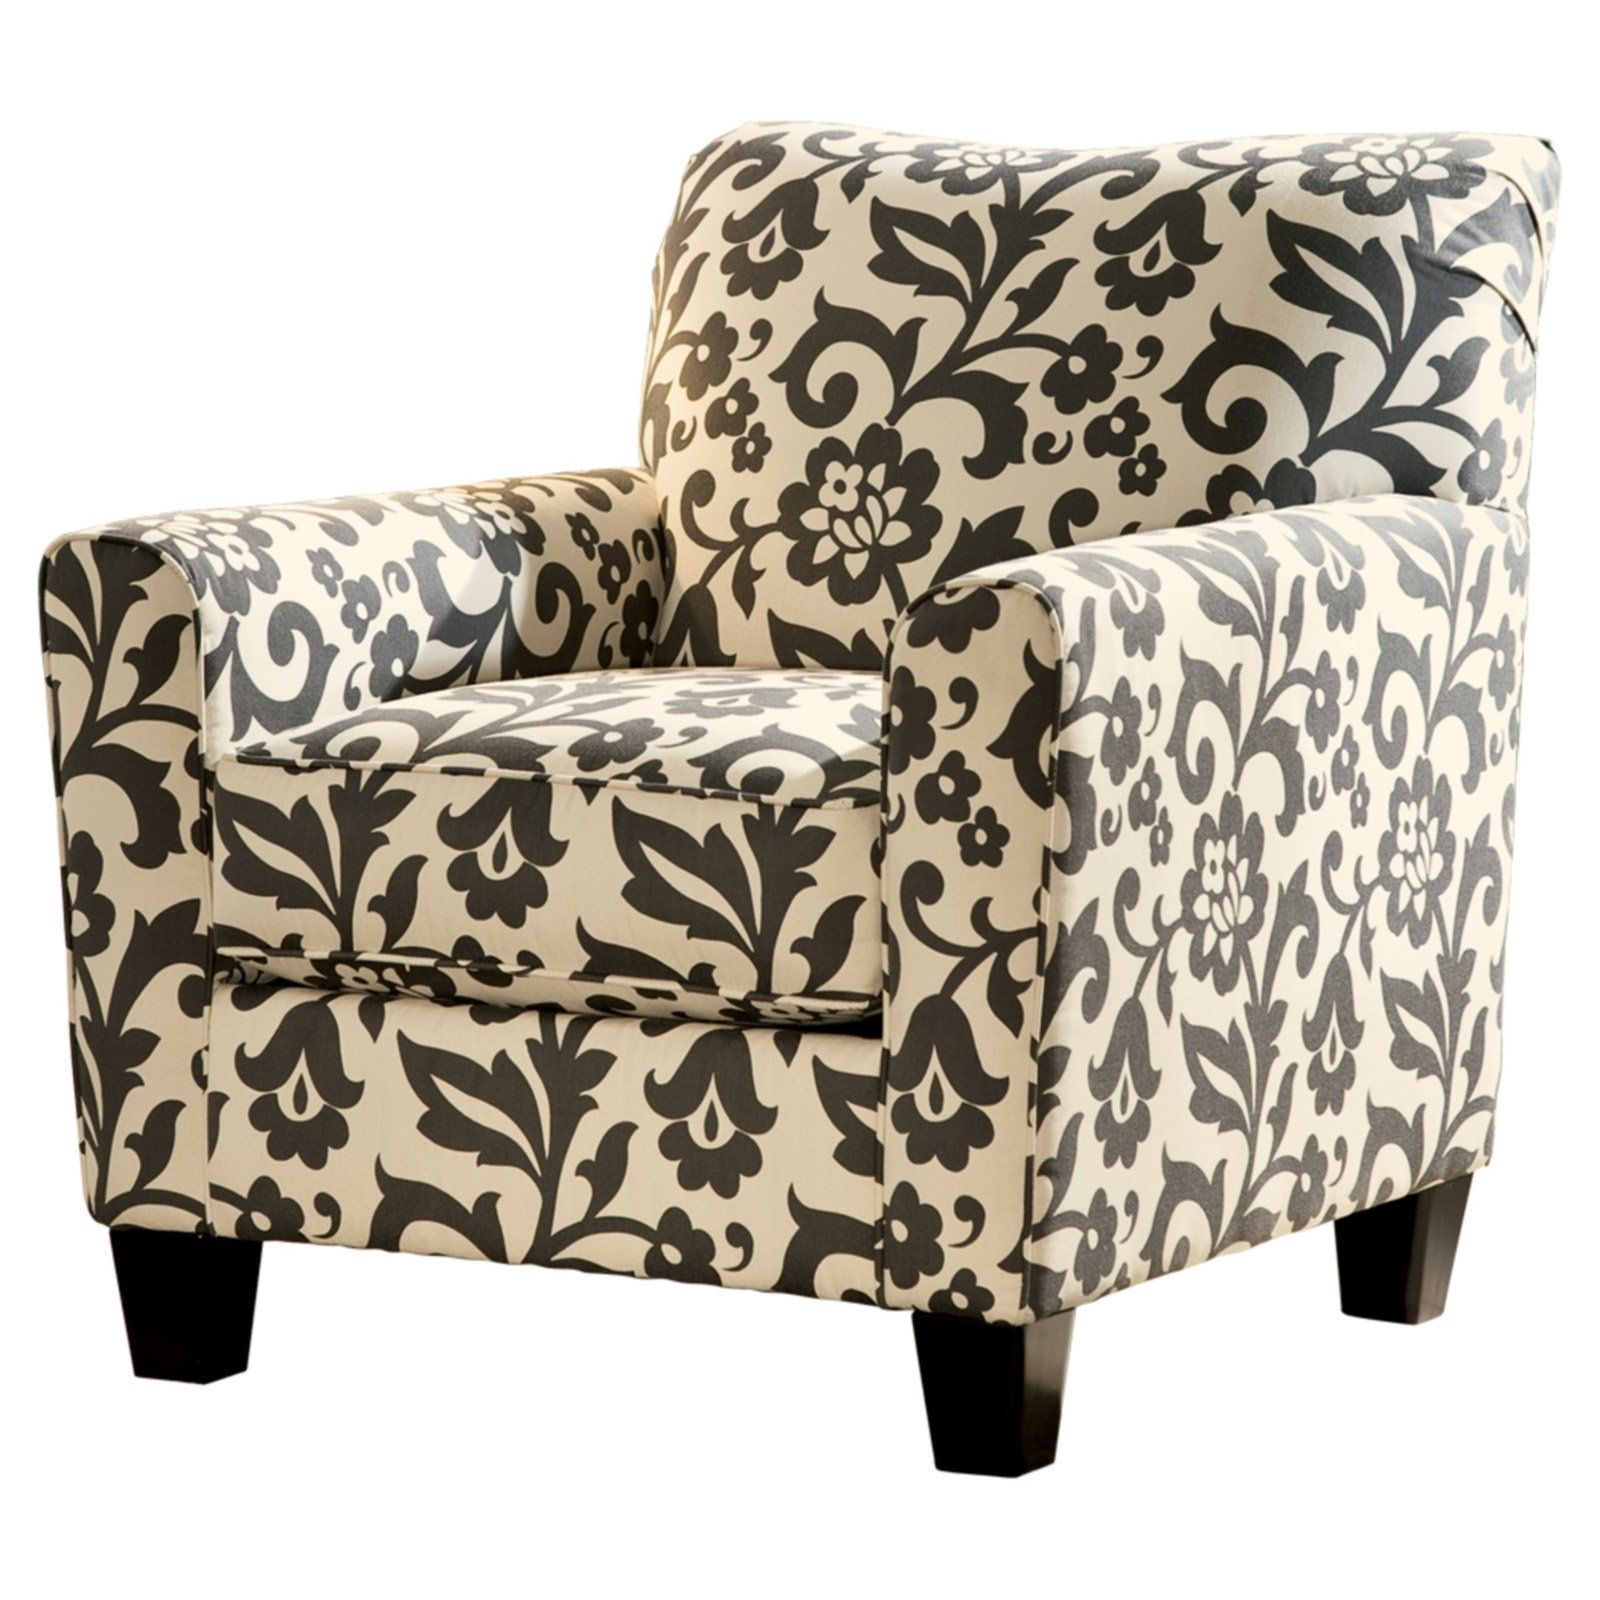 Signature Design By Ashley Levon Floral Accent Chair Accent